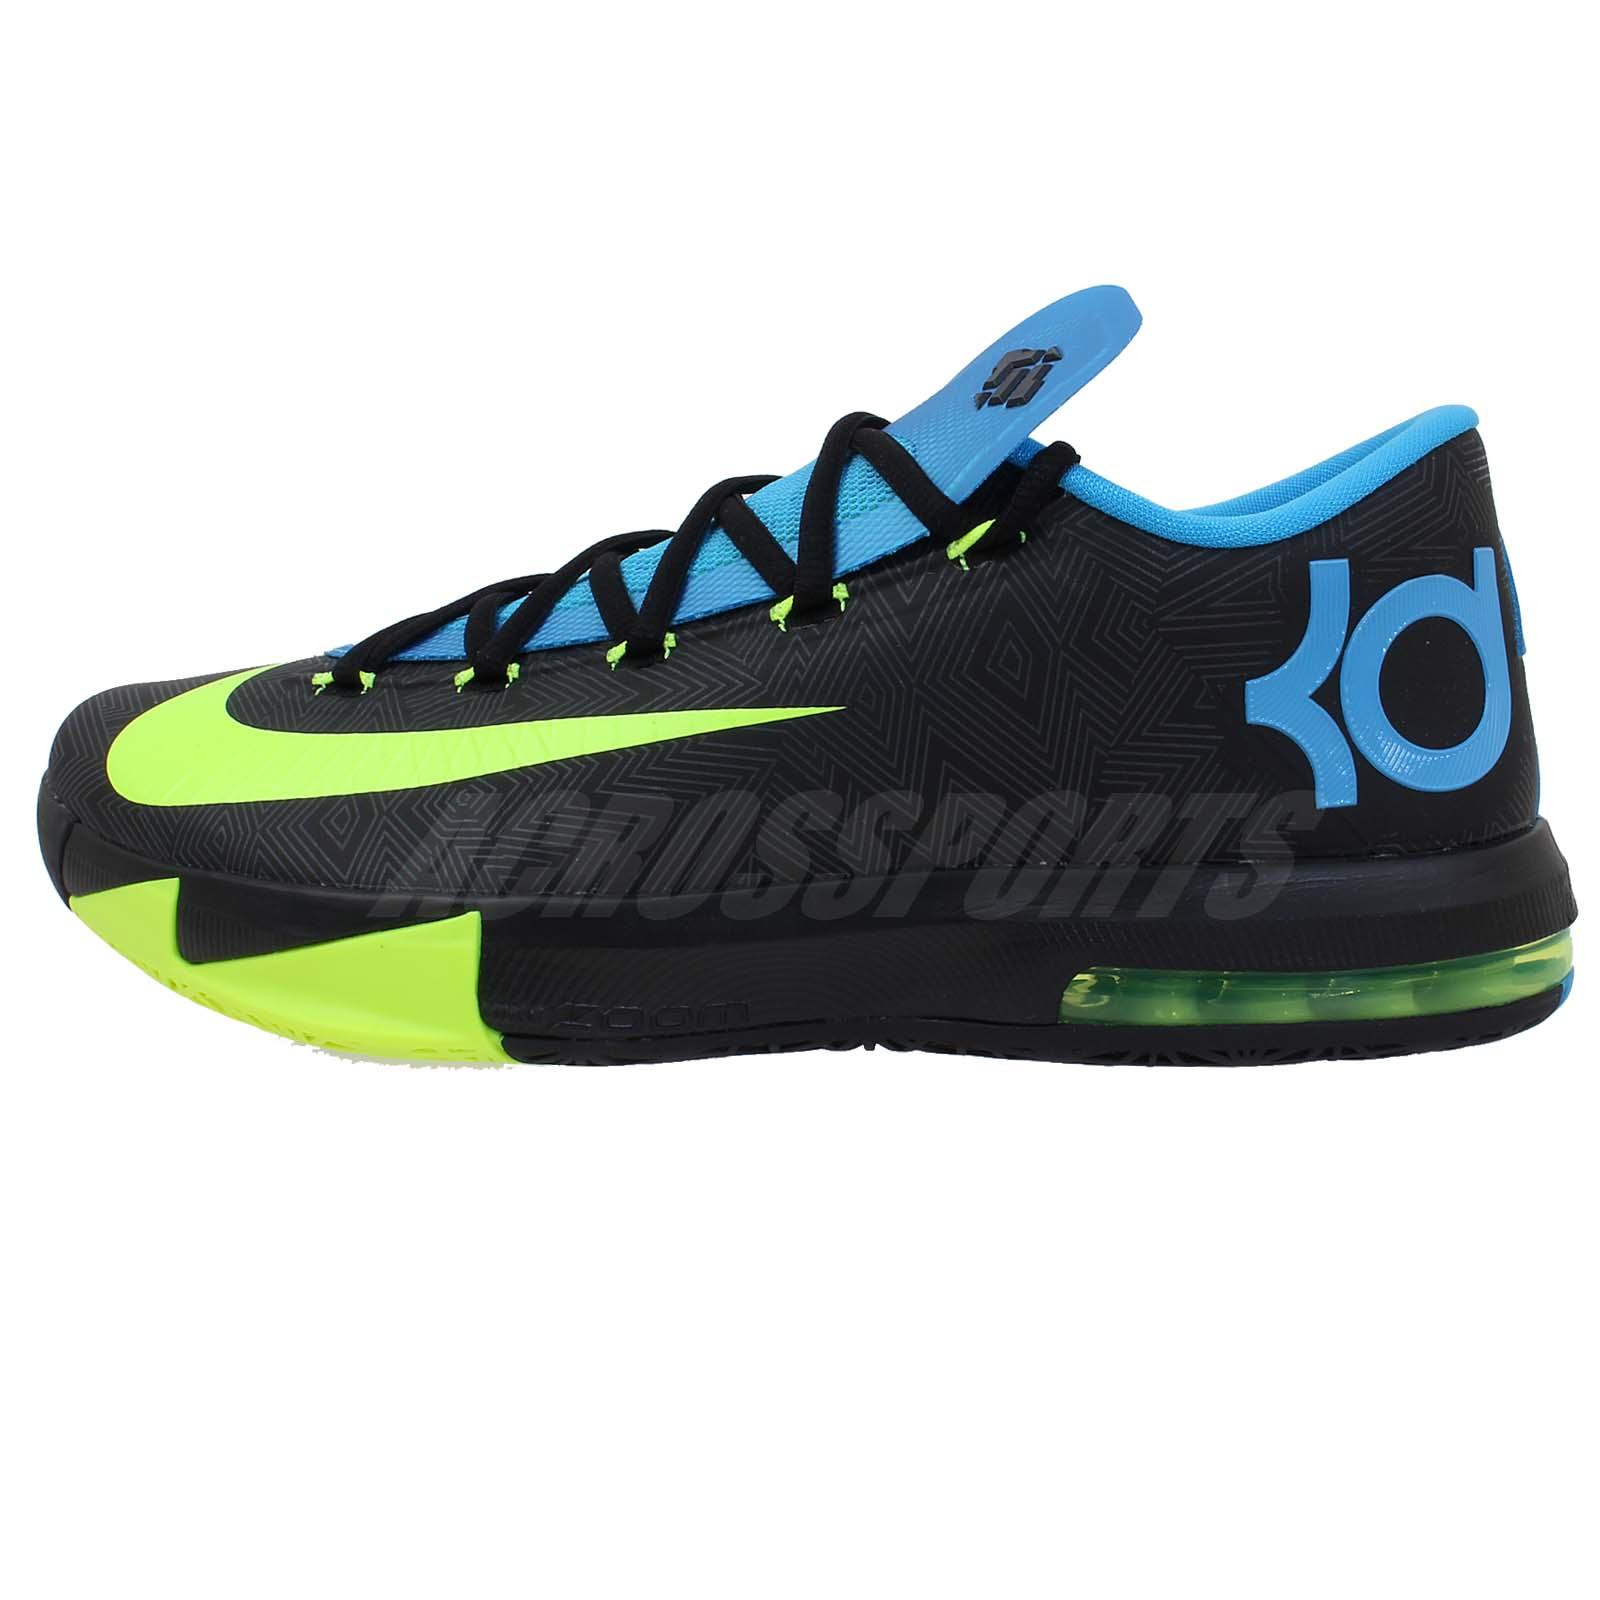 Nike KD VI 6 Kevin Durant Black Blue Volt Air Max 2014 ...